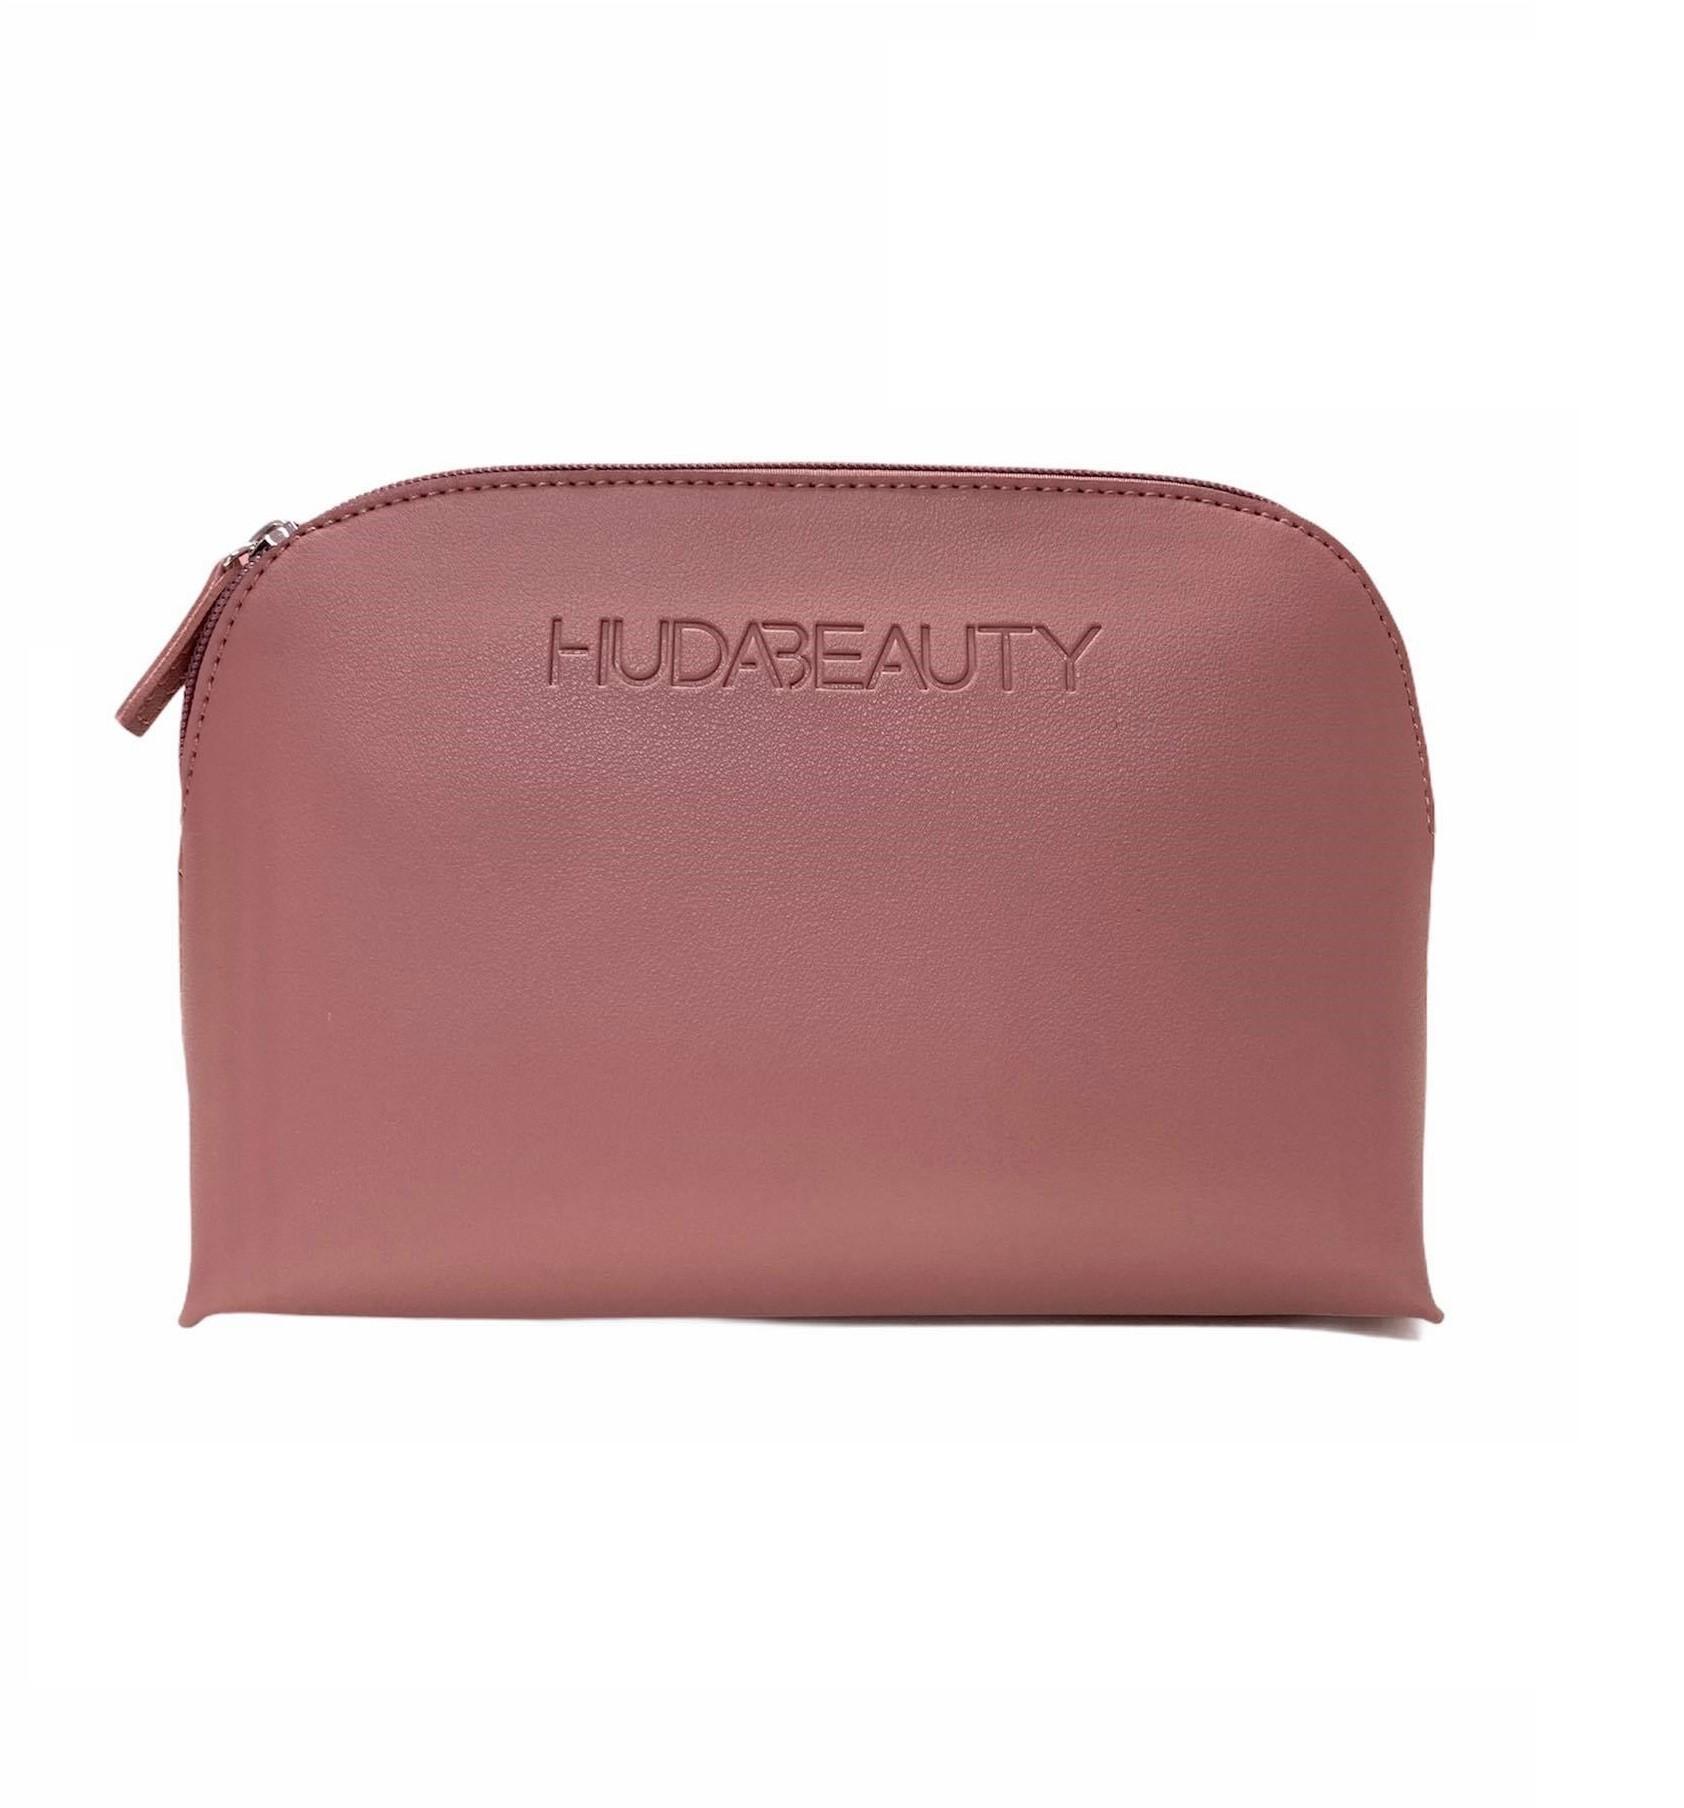 Makeup Bag HUDA BEAUTY